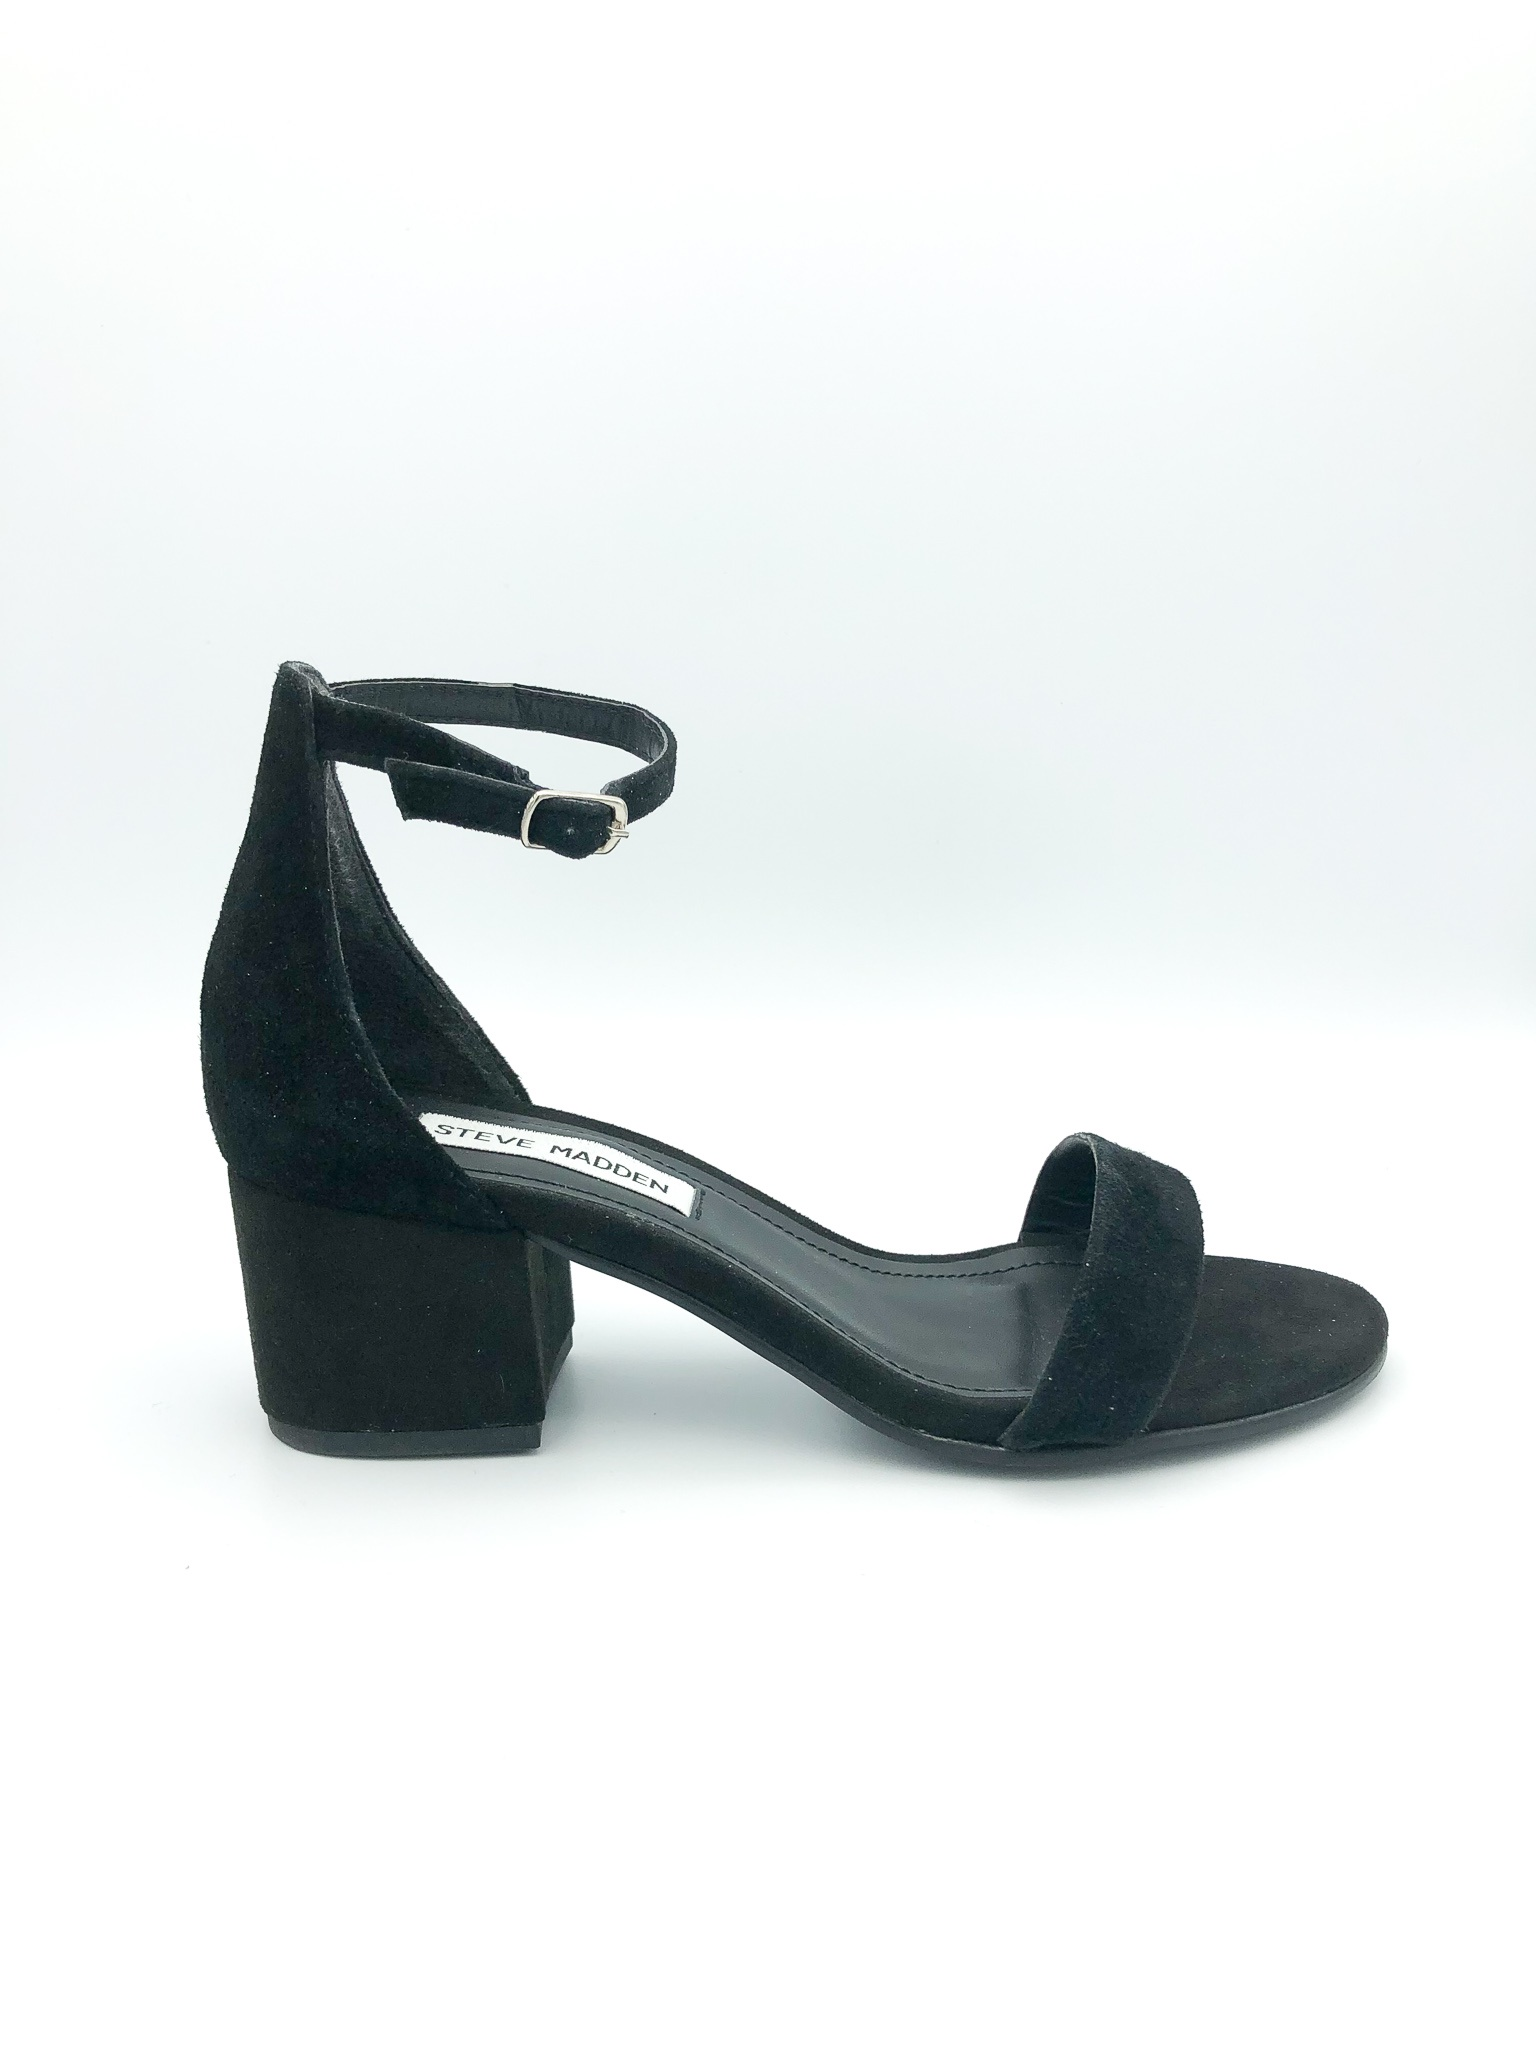 8b16b0960c3 STEVE MADDEN- IRENEE IN BLACK - the Urban Shoe Myth